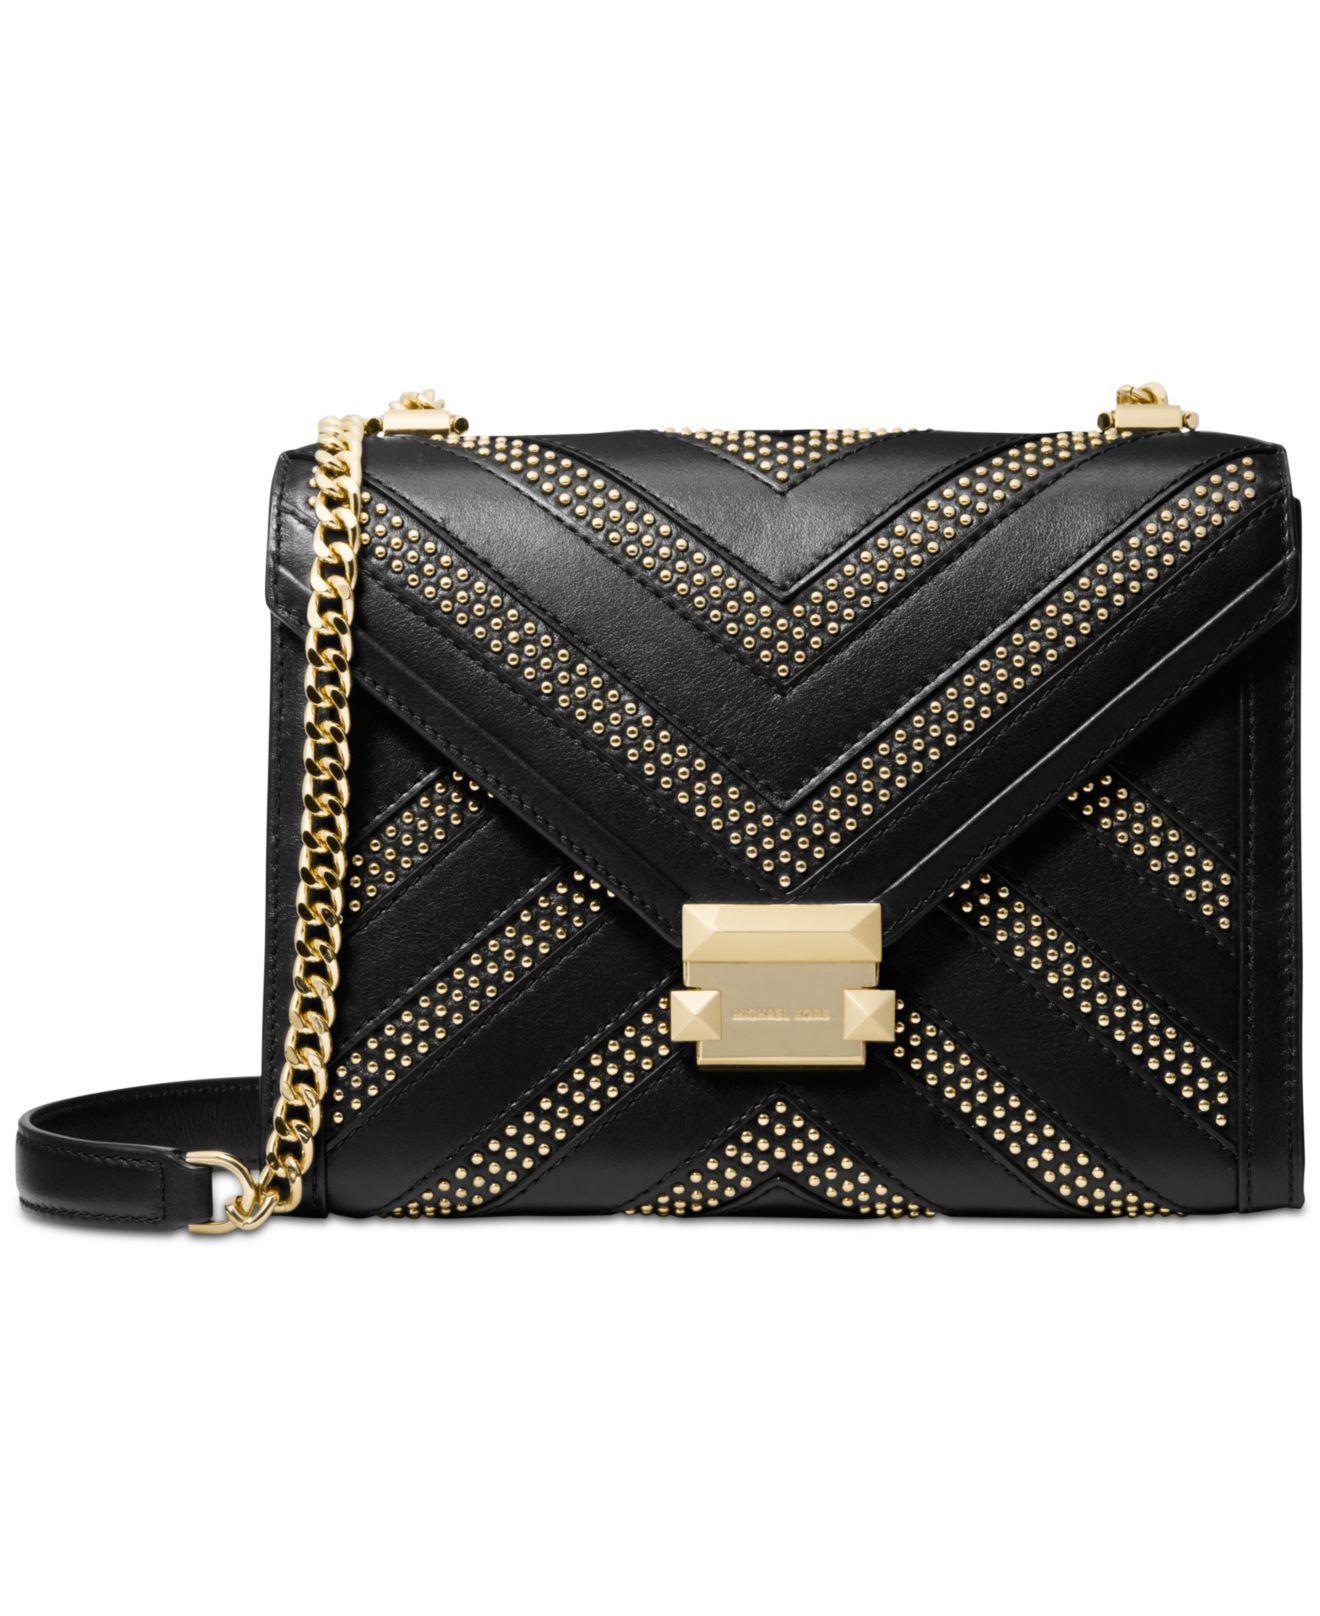 526063c2c095 Michael Kors. Women s Black Whitney Large Studded Leather Convertible Shoulder  Bag